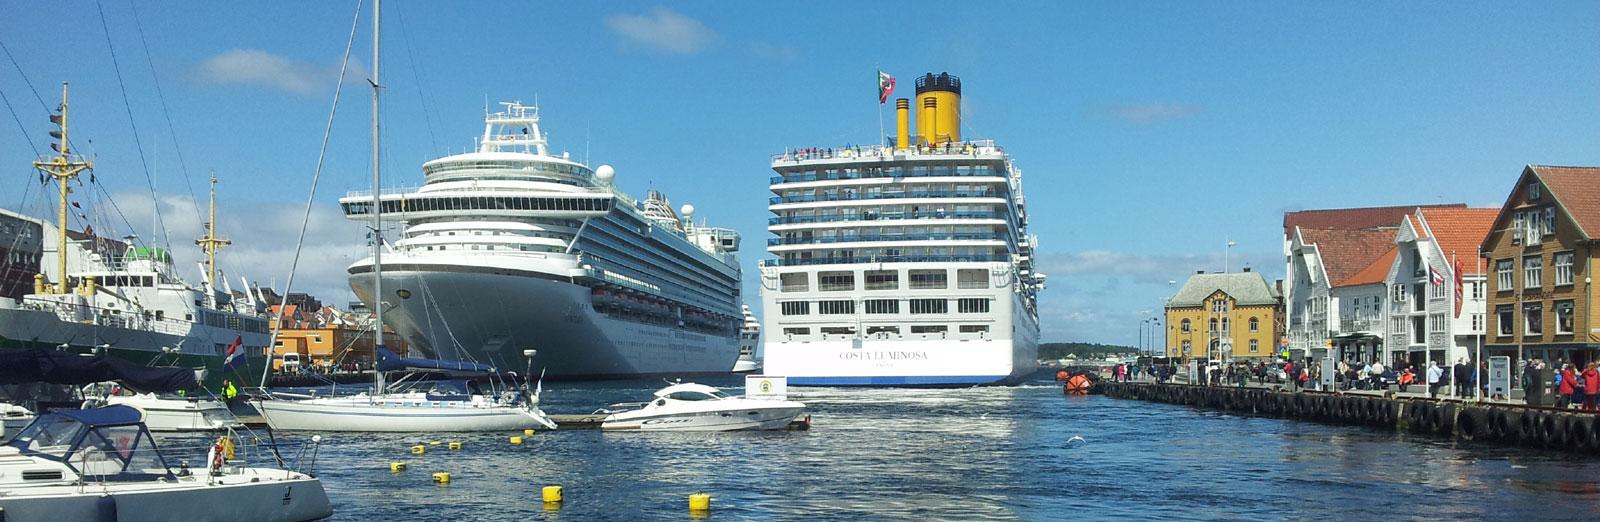 Stavangerregionen Havn IKS